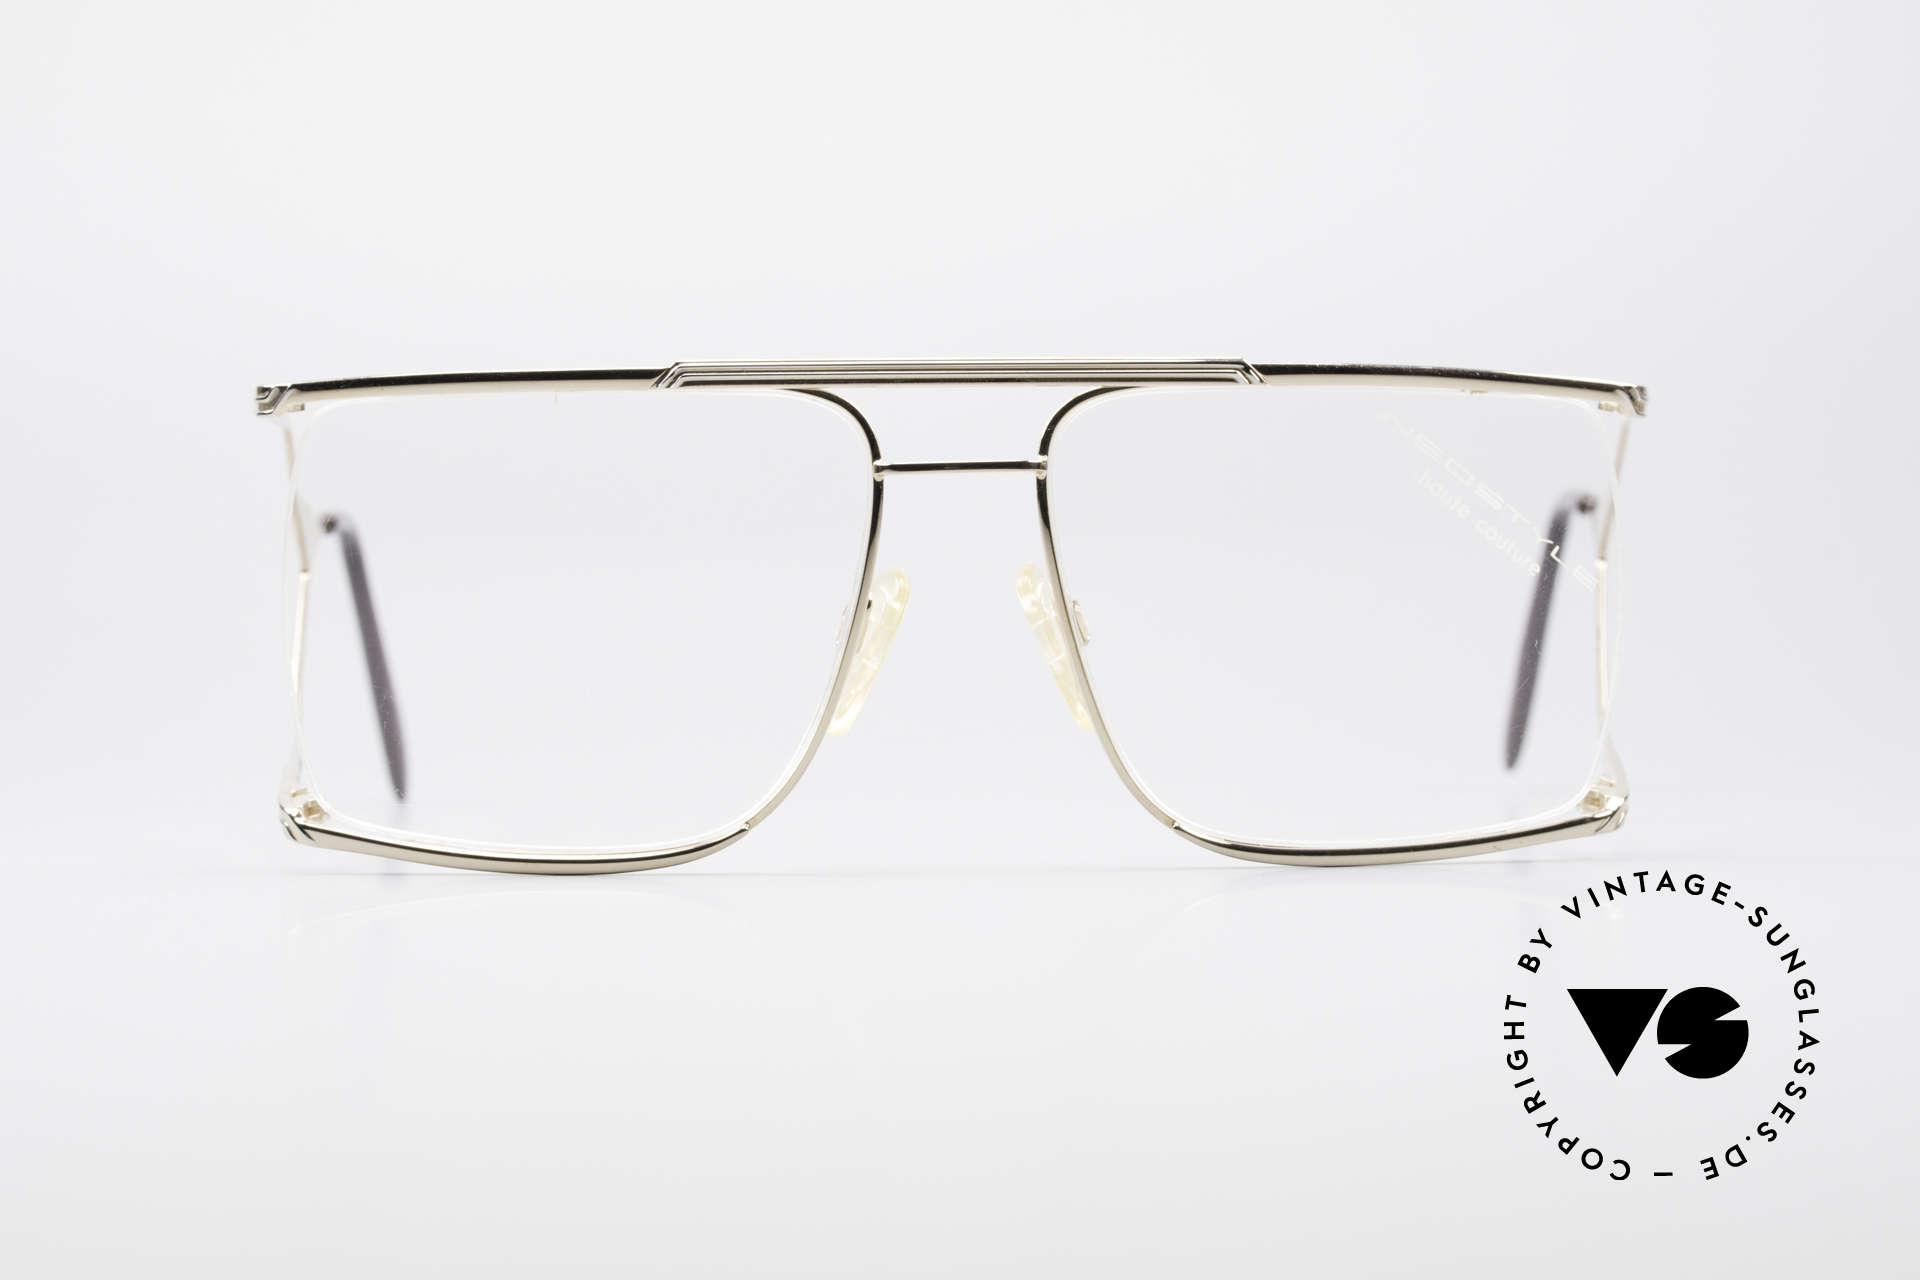 541fa4d2e1 Glasses Neostyle Nautic 6 80 s Miami Vice Eyeglasses